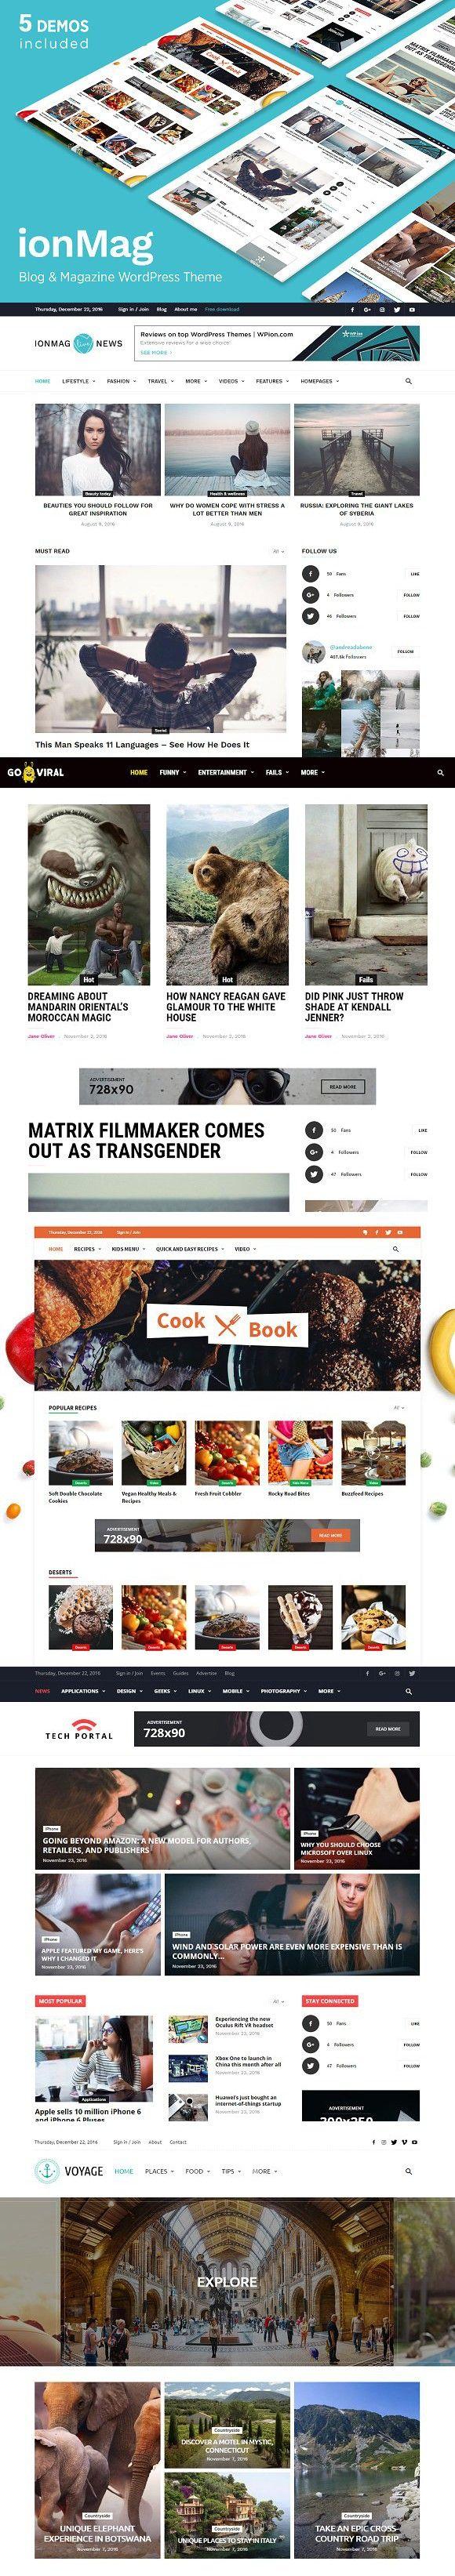 News Magazine Blog theme - ionMag. WordPress Magazine Themes